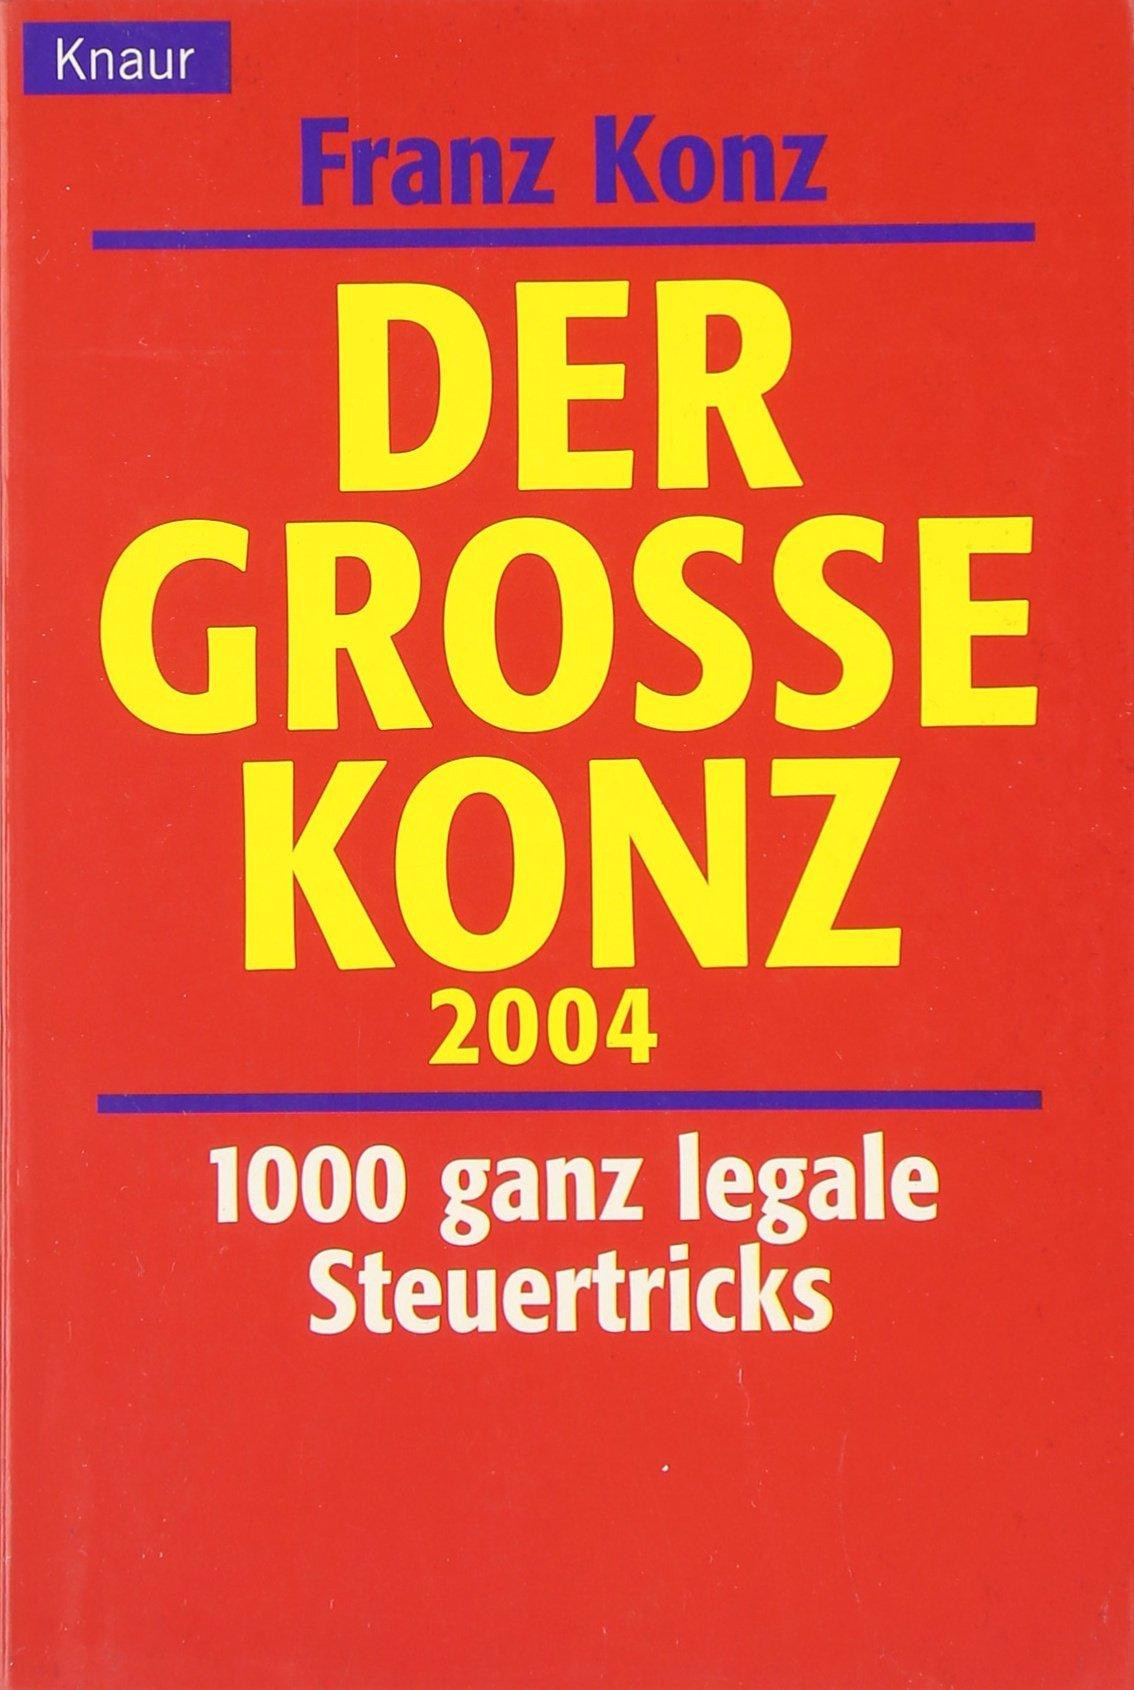 Der grosse Konz 2004